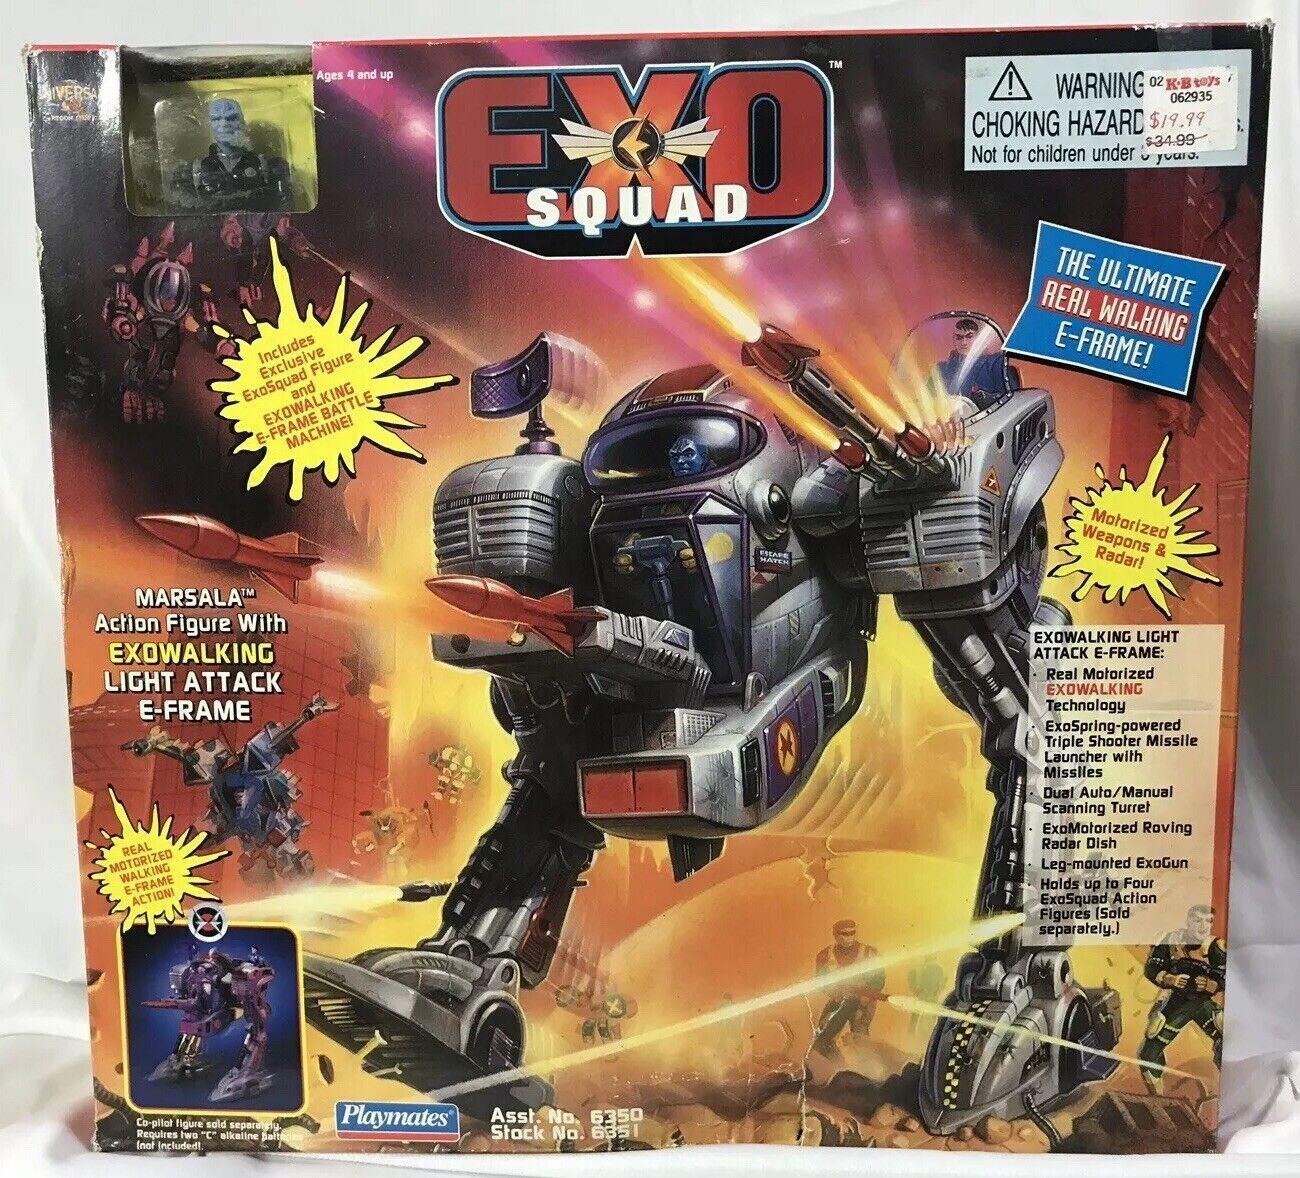 Luz de Exo Squad Marsala con exowalking ataque E-frame 1994 Jugarmates Sellado (b)